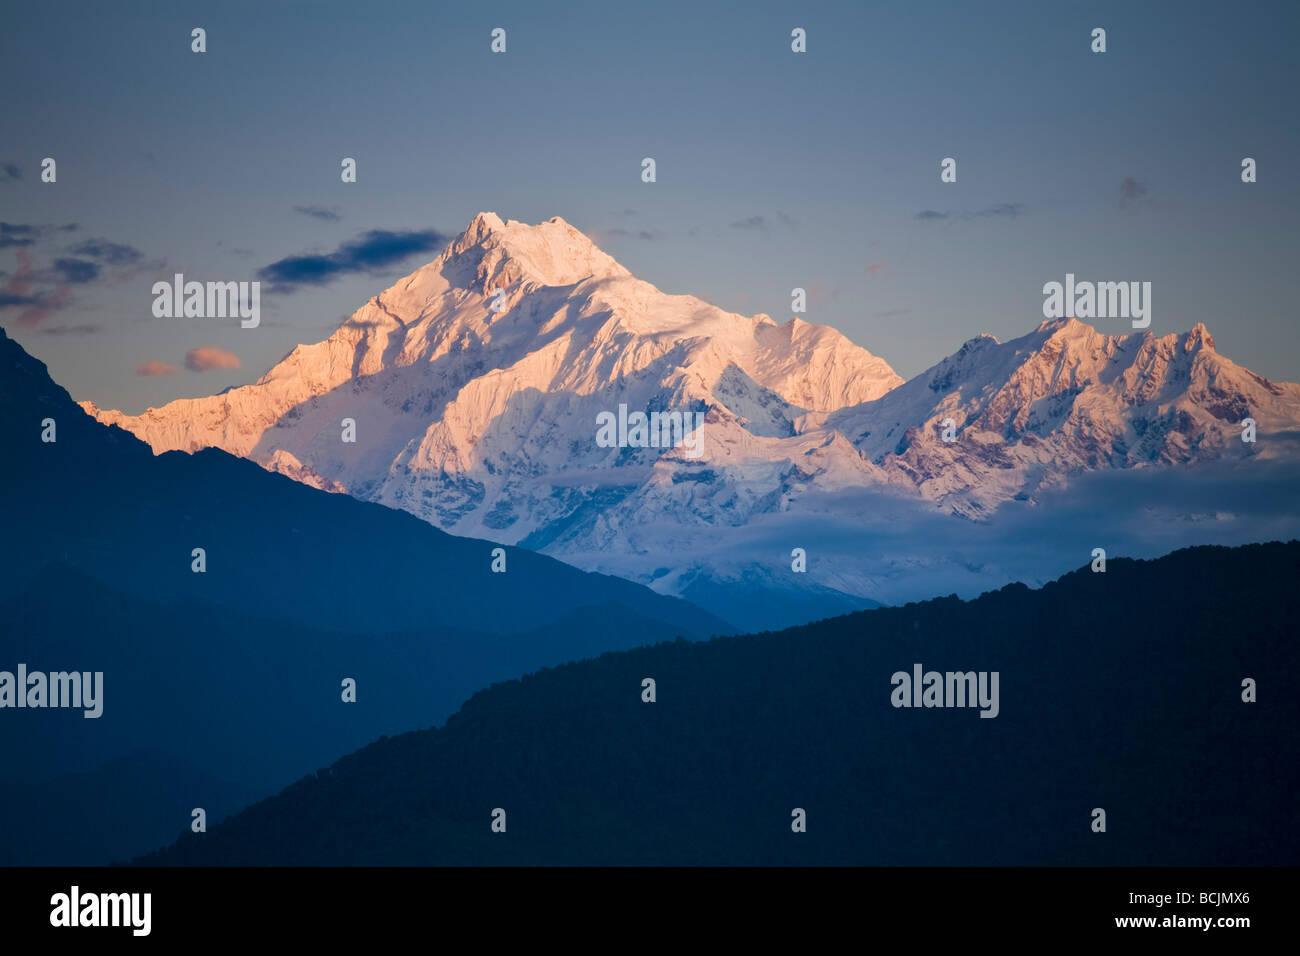 India, Sikkim, Gangtok, Ganesh Tok viewpoint, Vista del Kangchenjunga, gama de Kangchendzonga Imagen De Stock